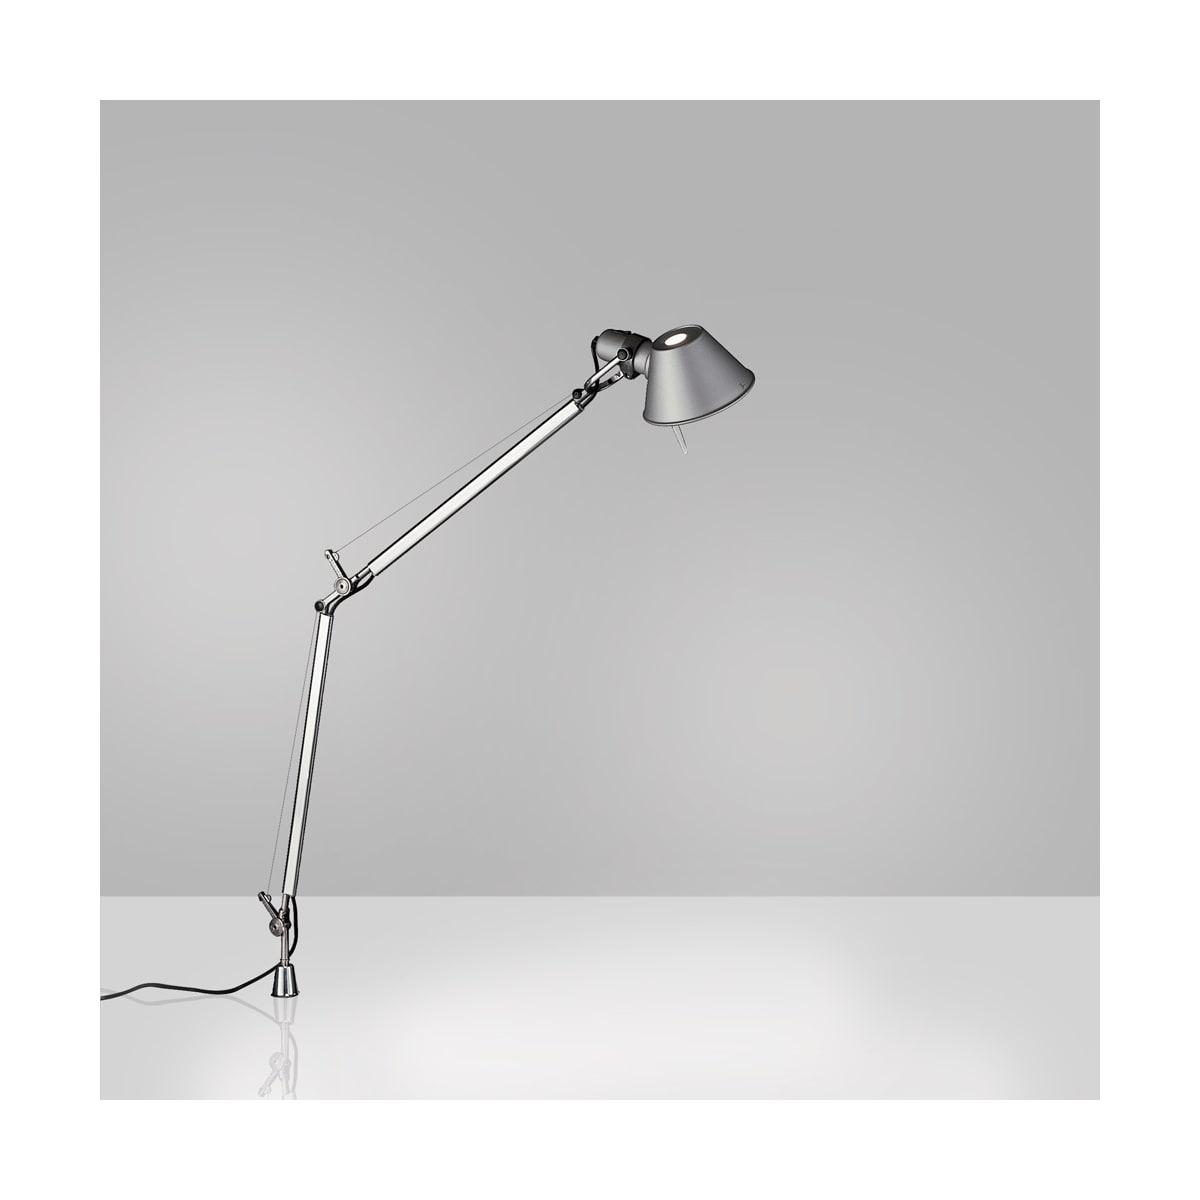 Artemide Usc Tol0082 Aluminum 3000k 80cri Tolomeo Single Light 19 11 16 Tall Integrated Led Swing Arm Table Lamp With Aluminum In Set Pivot Lightingshowplace Com